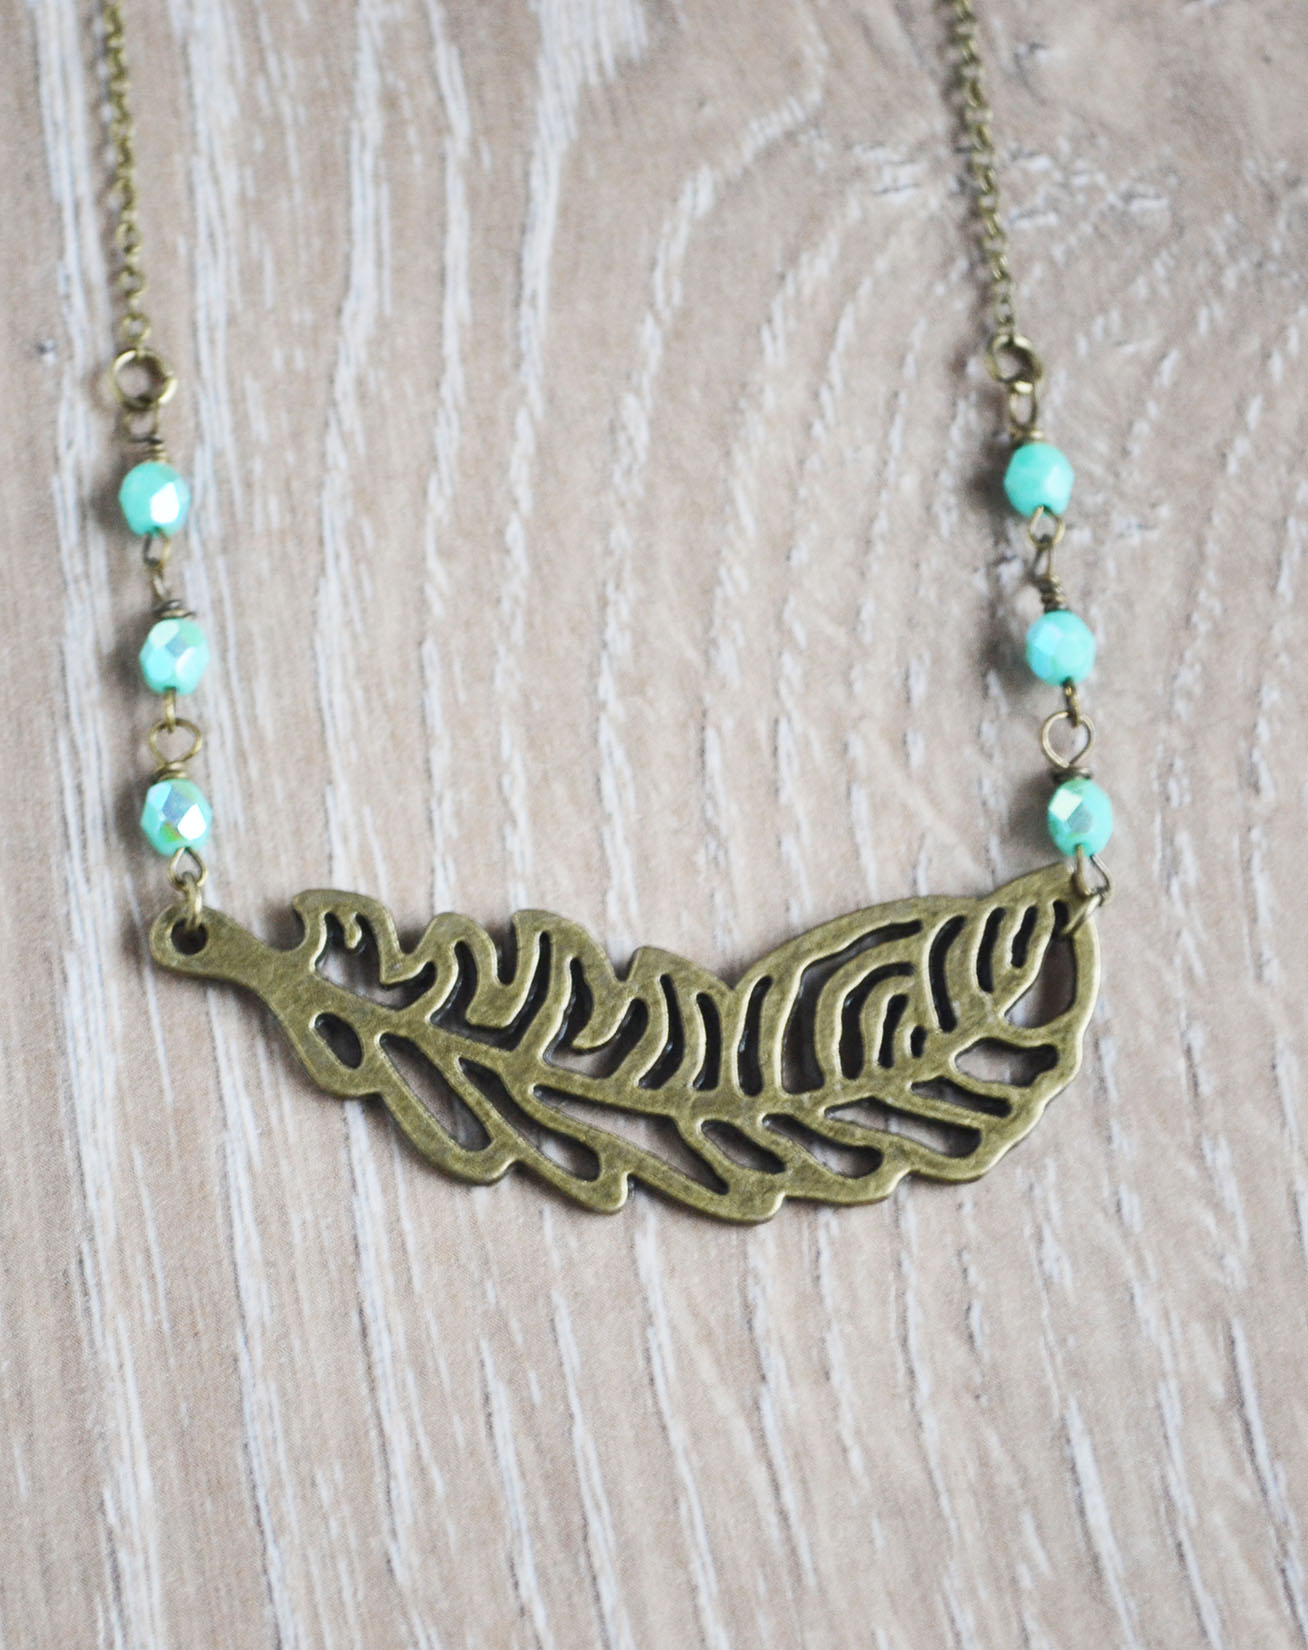 Feather Bohemian Necklace Boho Jewelry Mint Czech Beads